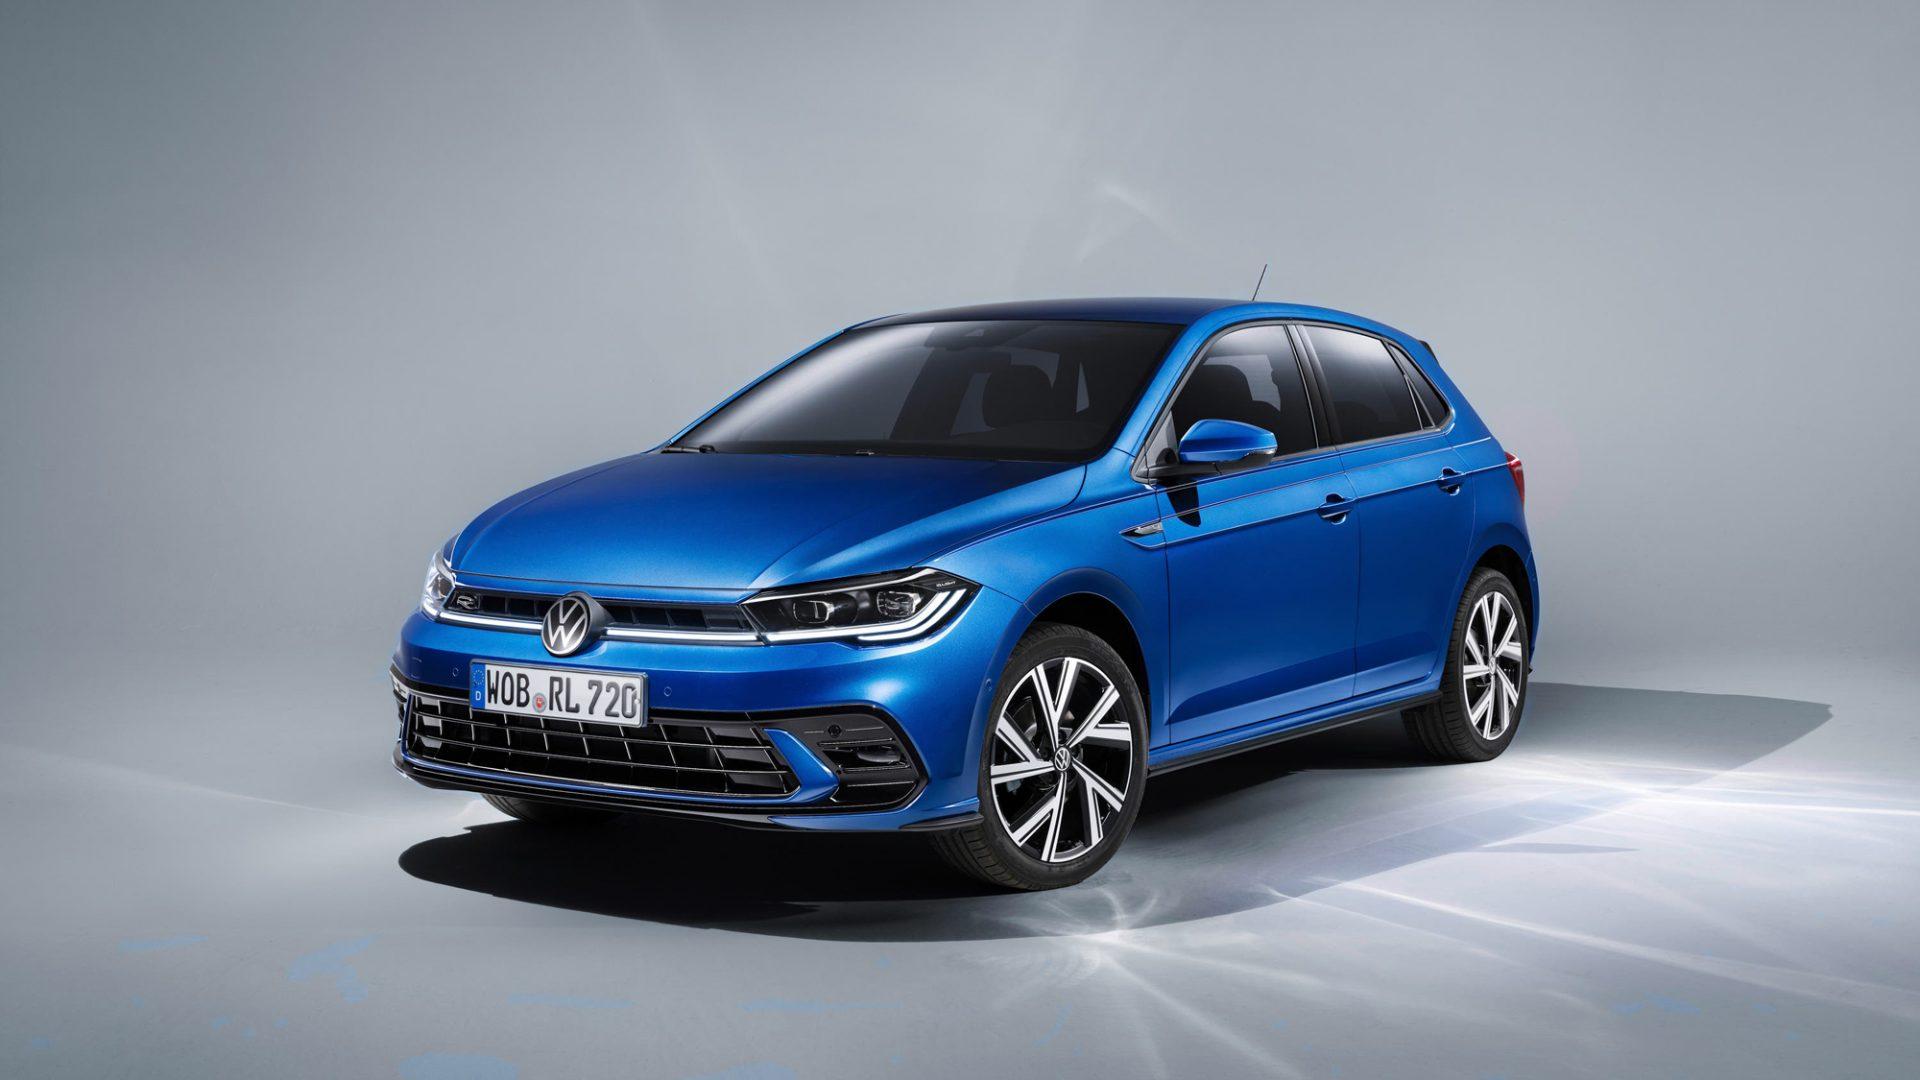 Volkswagen Polo April 2021